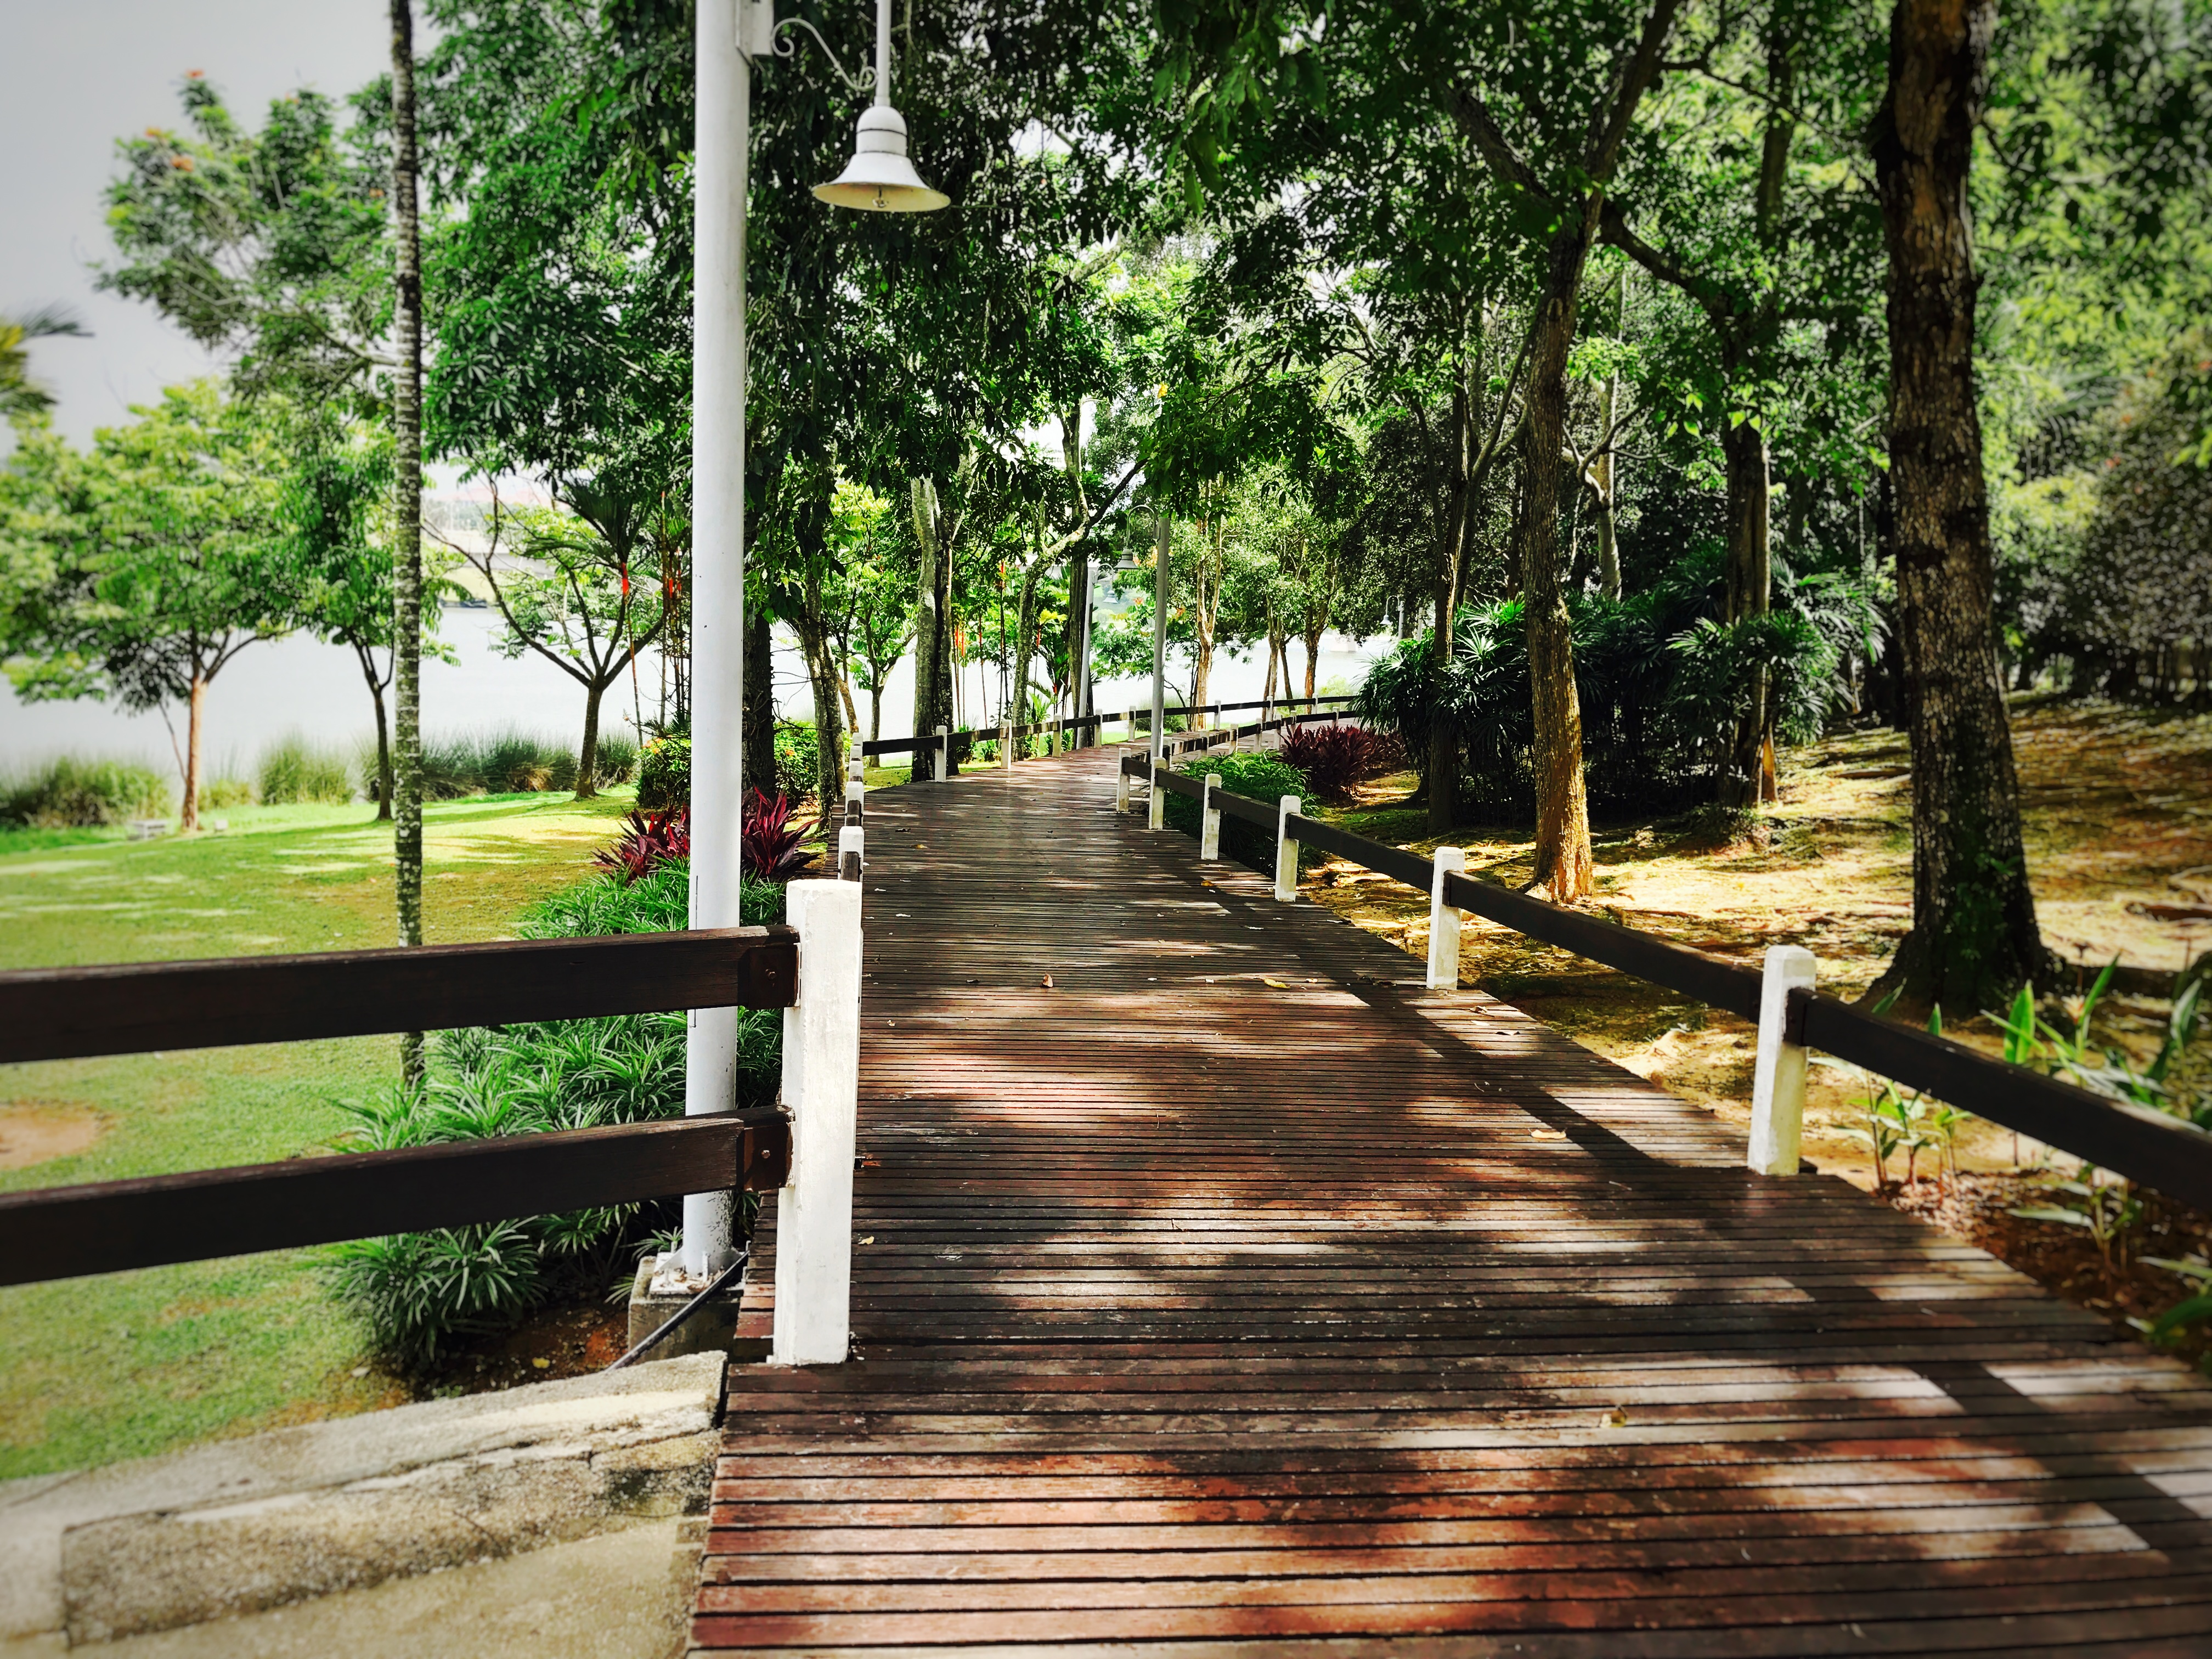 putra palace pathways